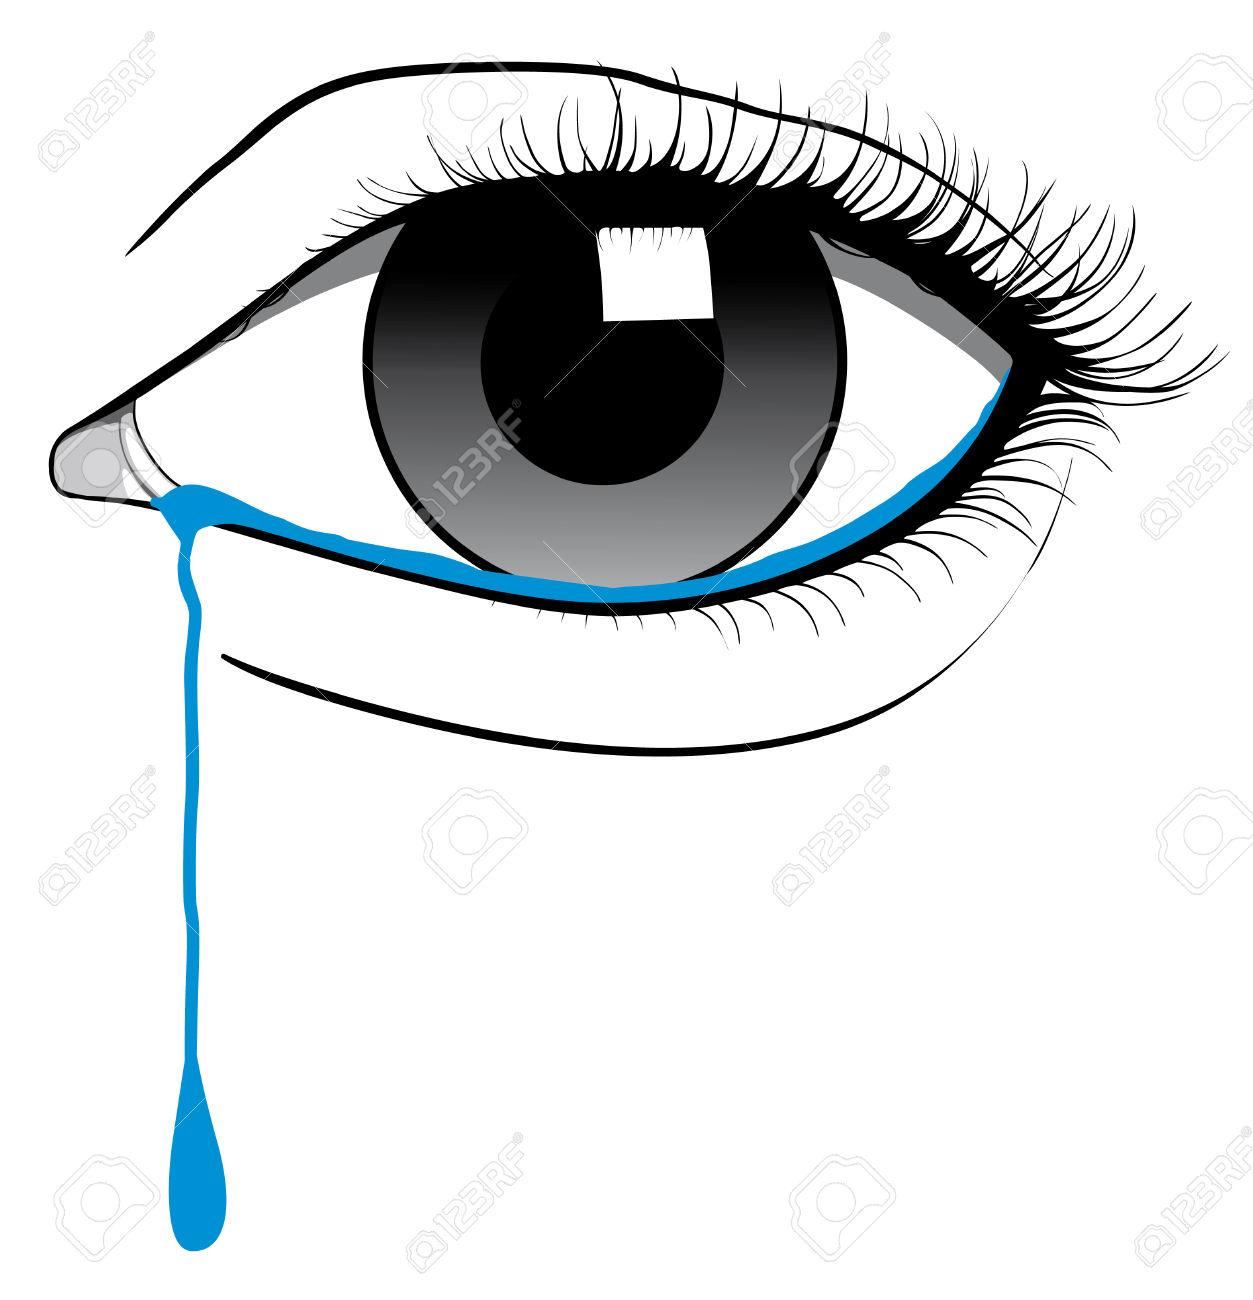 Crying Eye Royalty Free Cliparts, Vectors, And Stock Illustration.